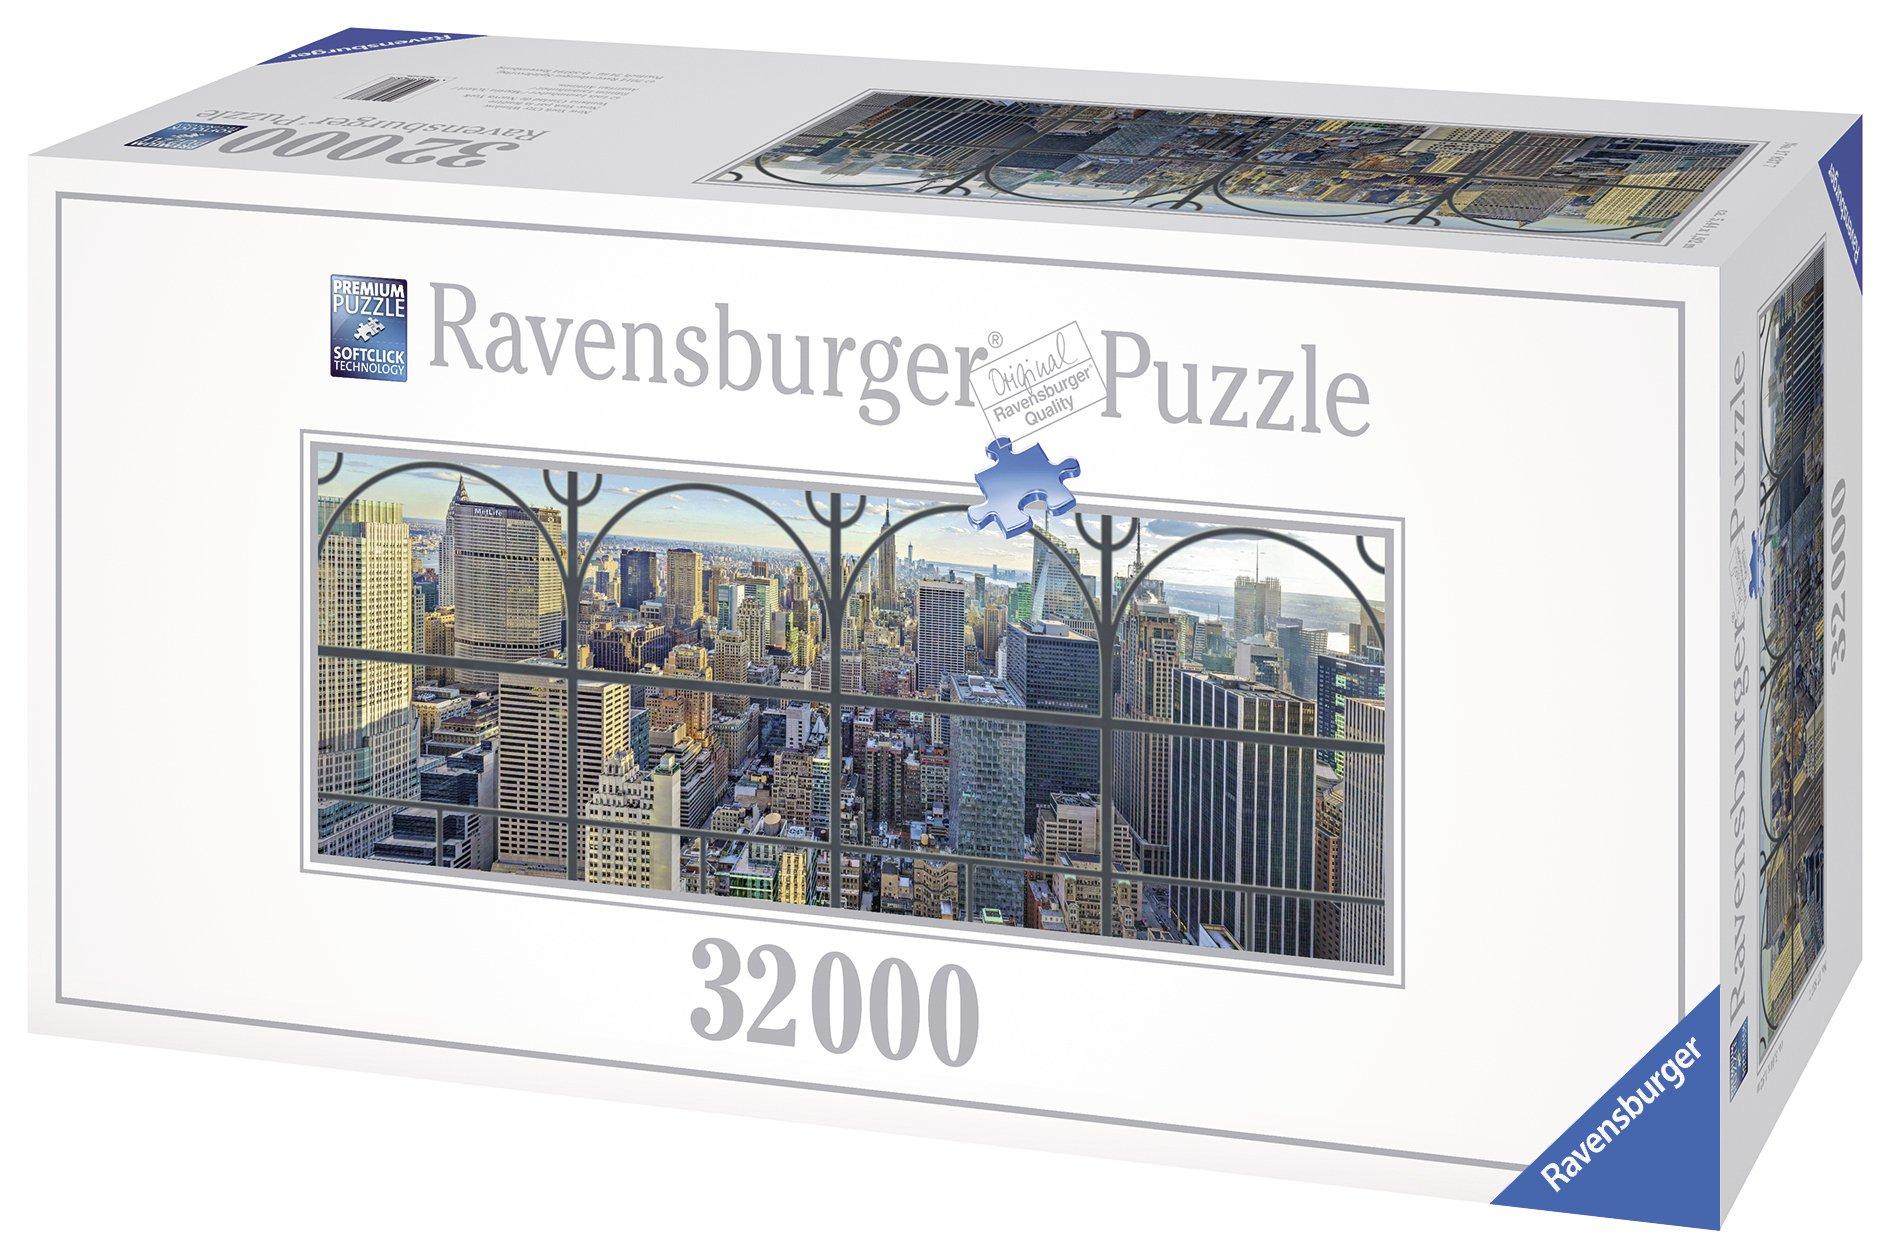 Ravensburger New York City Jigsaw Puzzle (32000-Piece) by Ravensburger (Image #1)